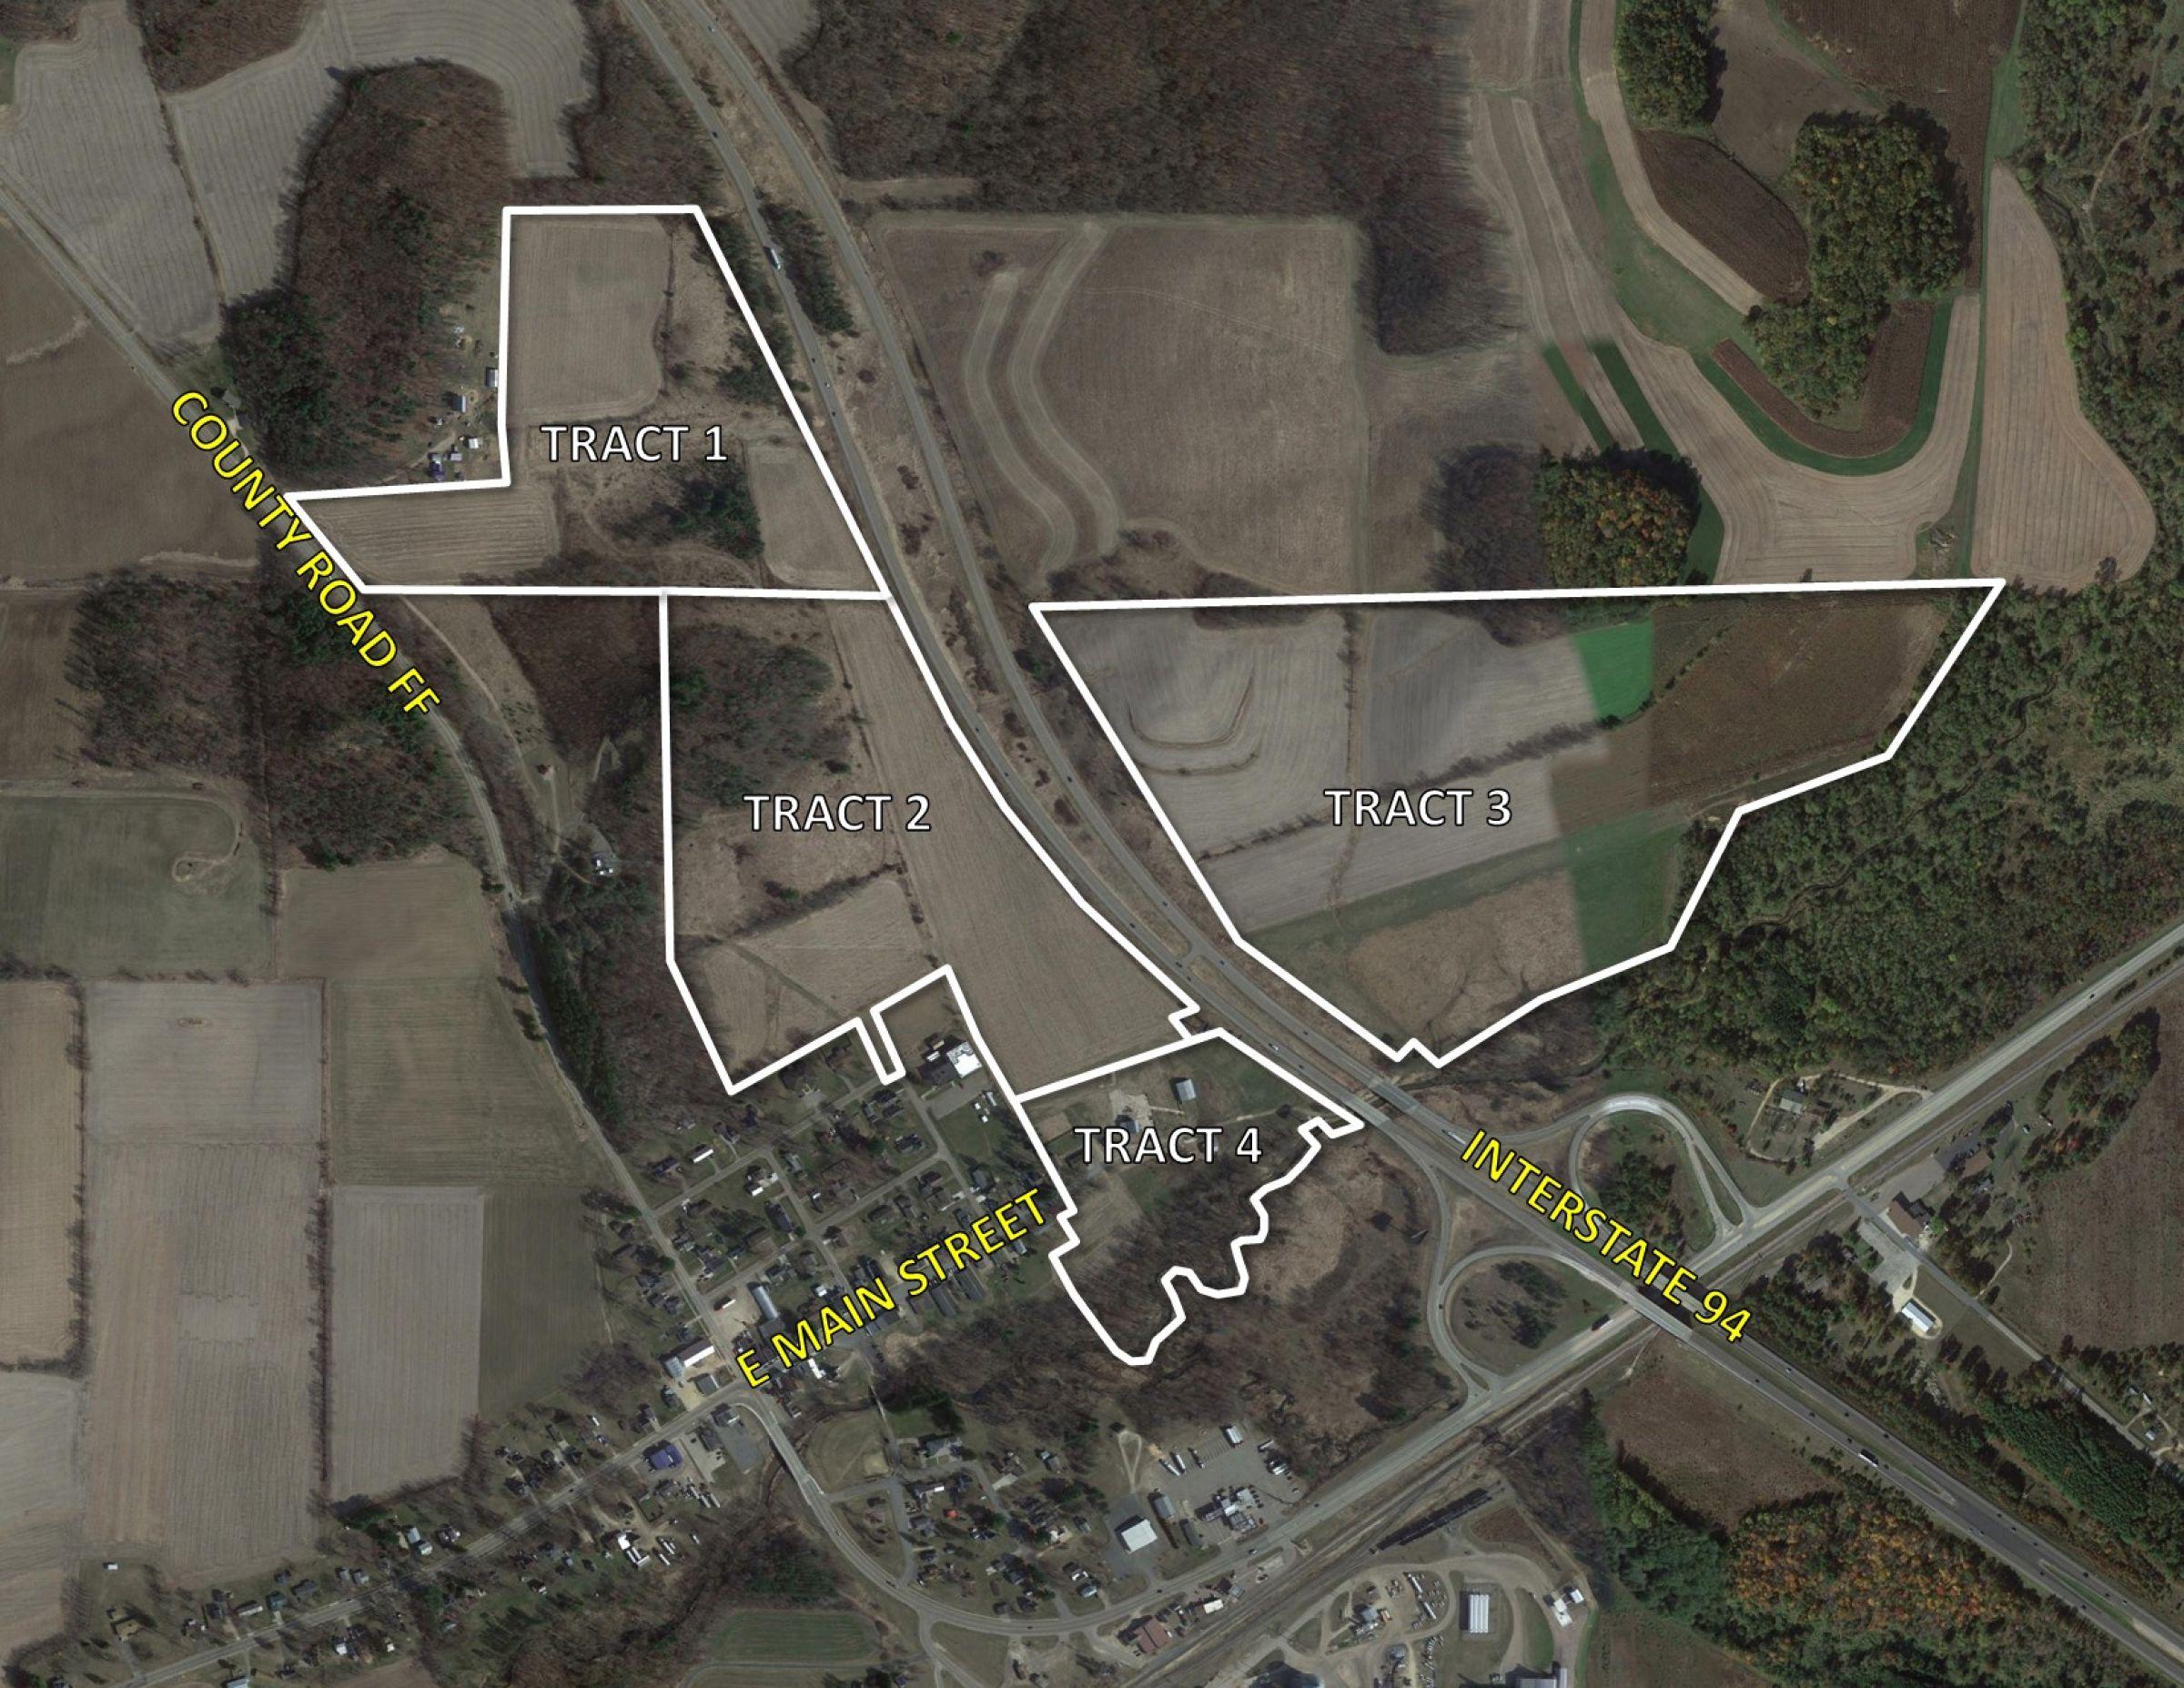 2-4449-acres-ml-3rd-street-hixton-54635-0-2021-09-18-204612.jpg